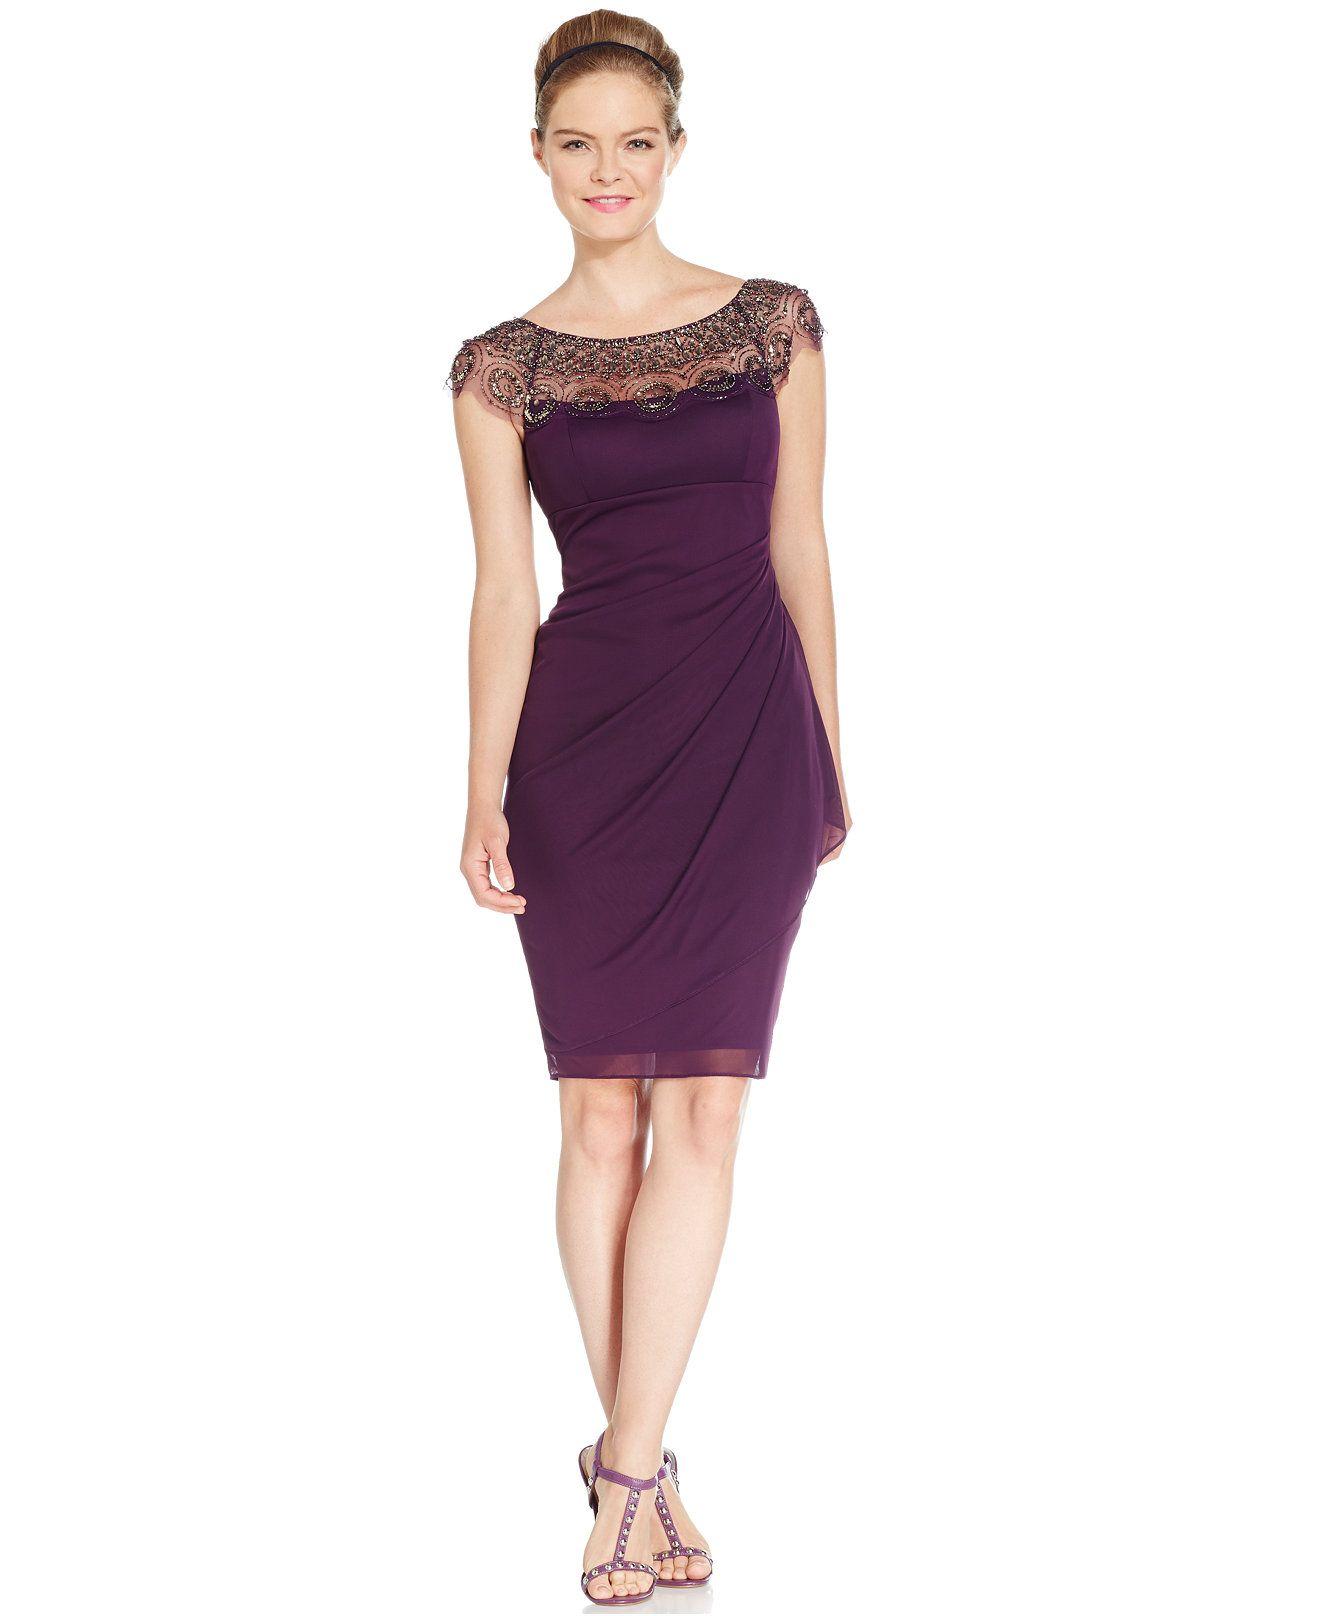 Xscape Cap-Sleeve Illusion Beaded Dress - Dresses - Women - Macy\'s ...